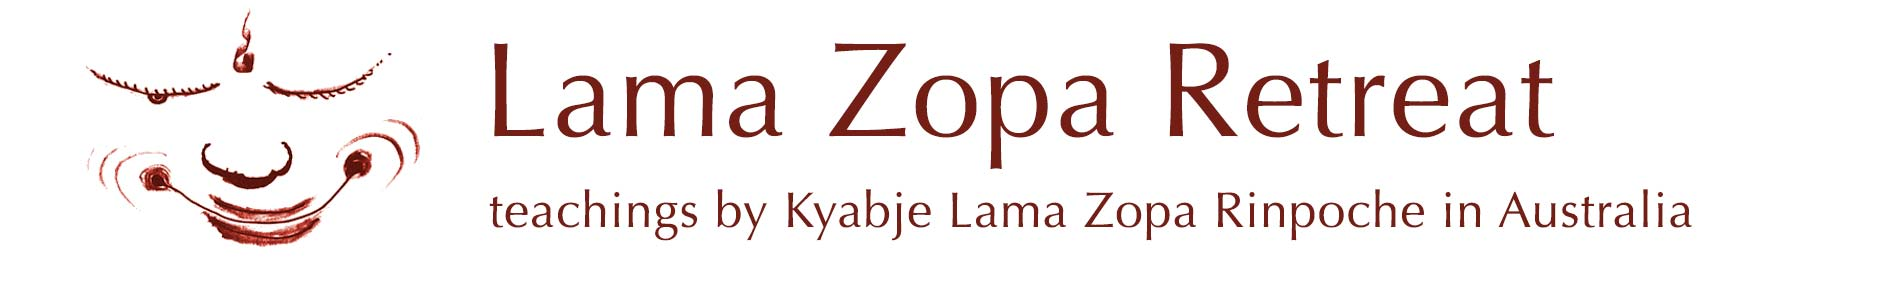 Lama Zopa Retreat @ Atisha Centre Logo